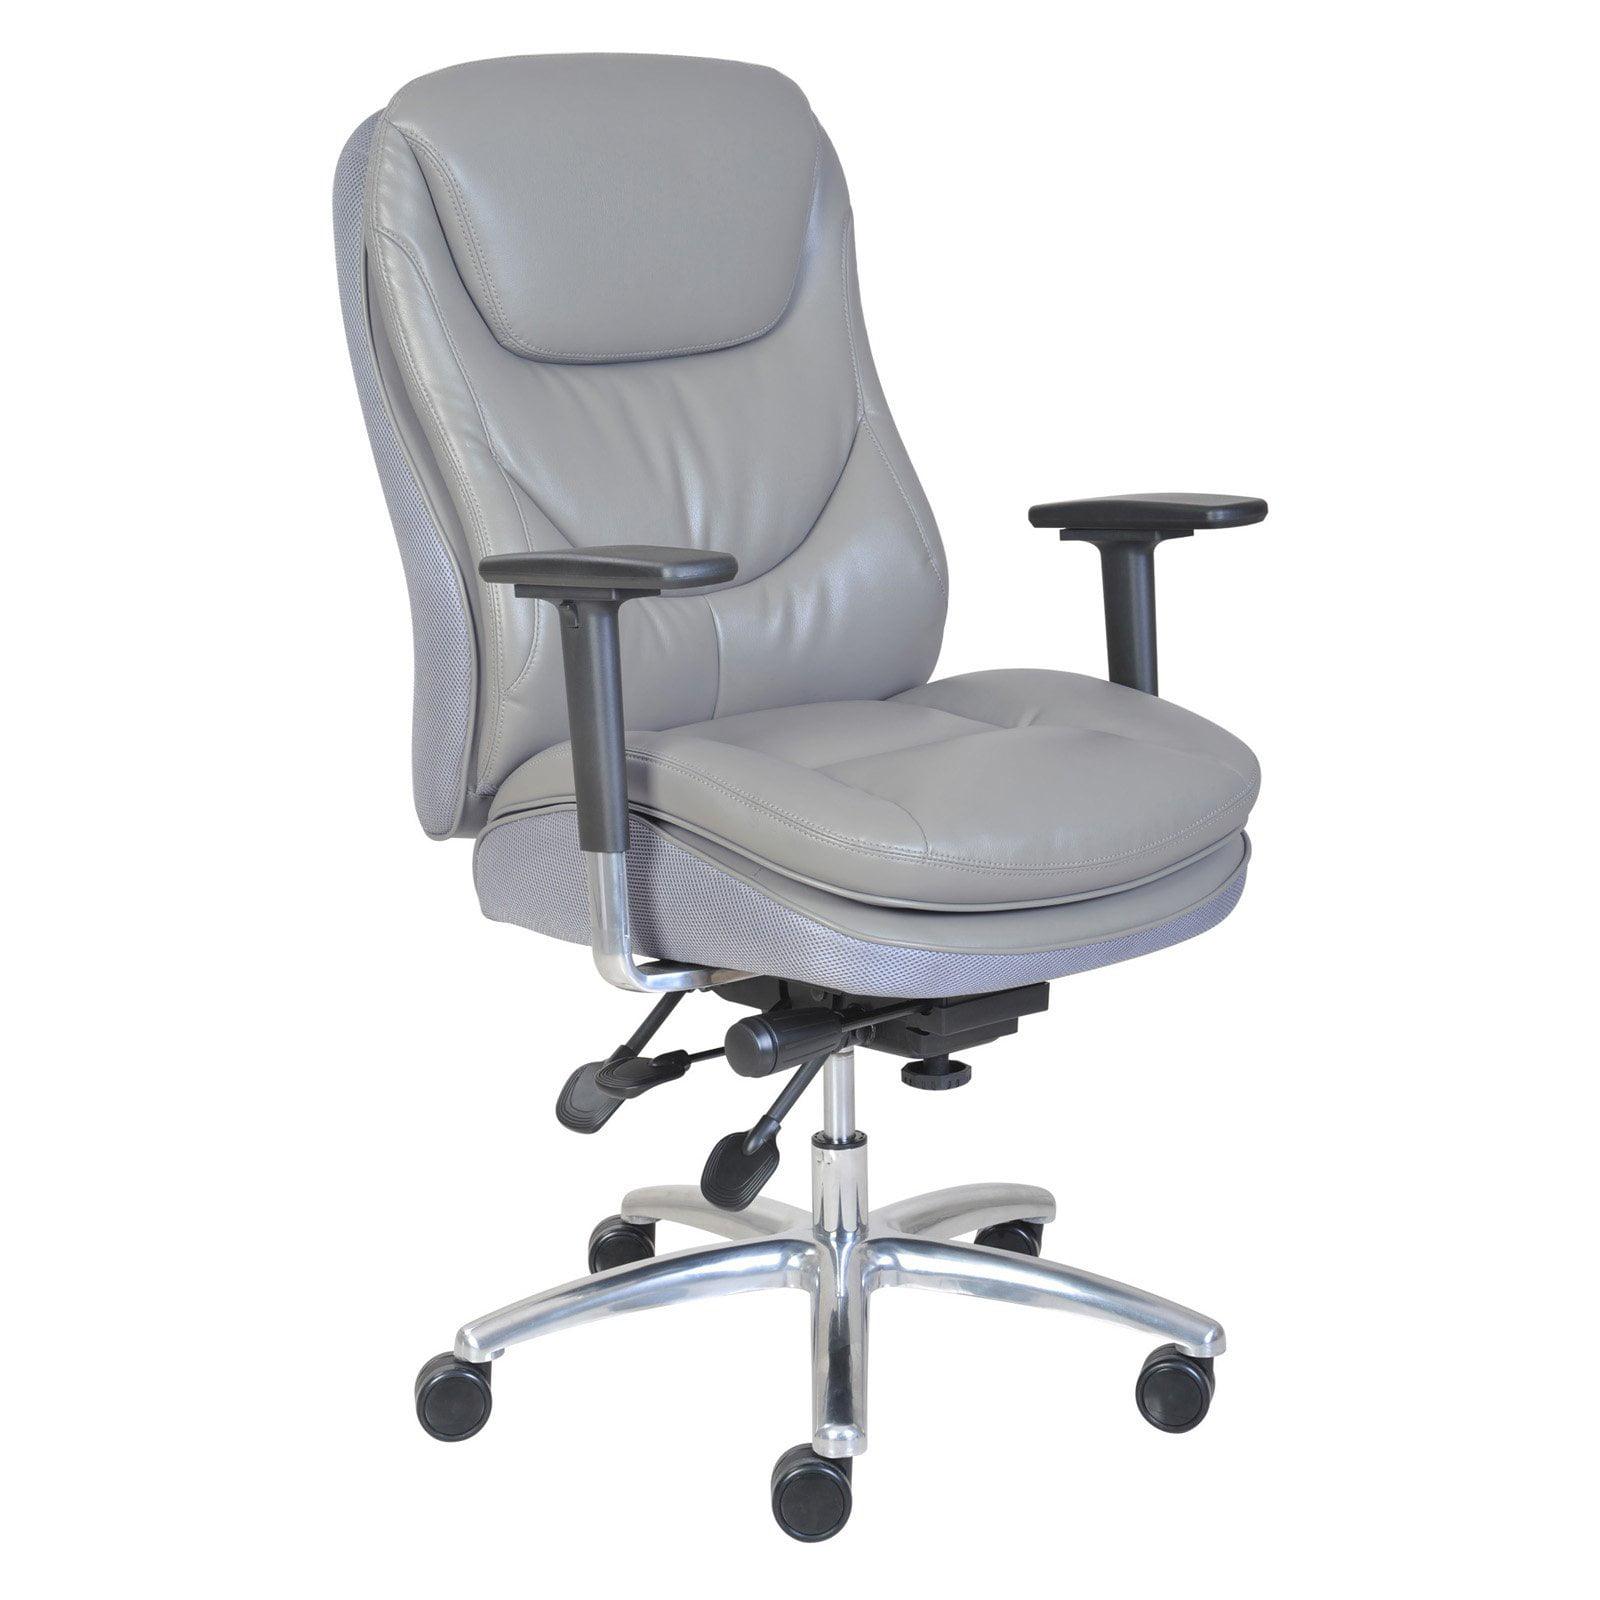 Serta Series 600 Task Chair Walmart